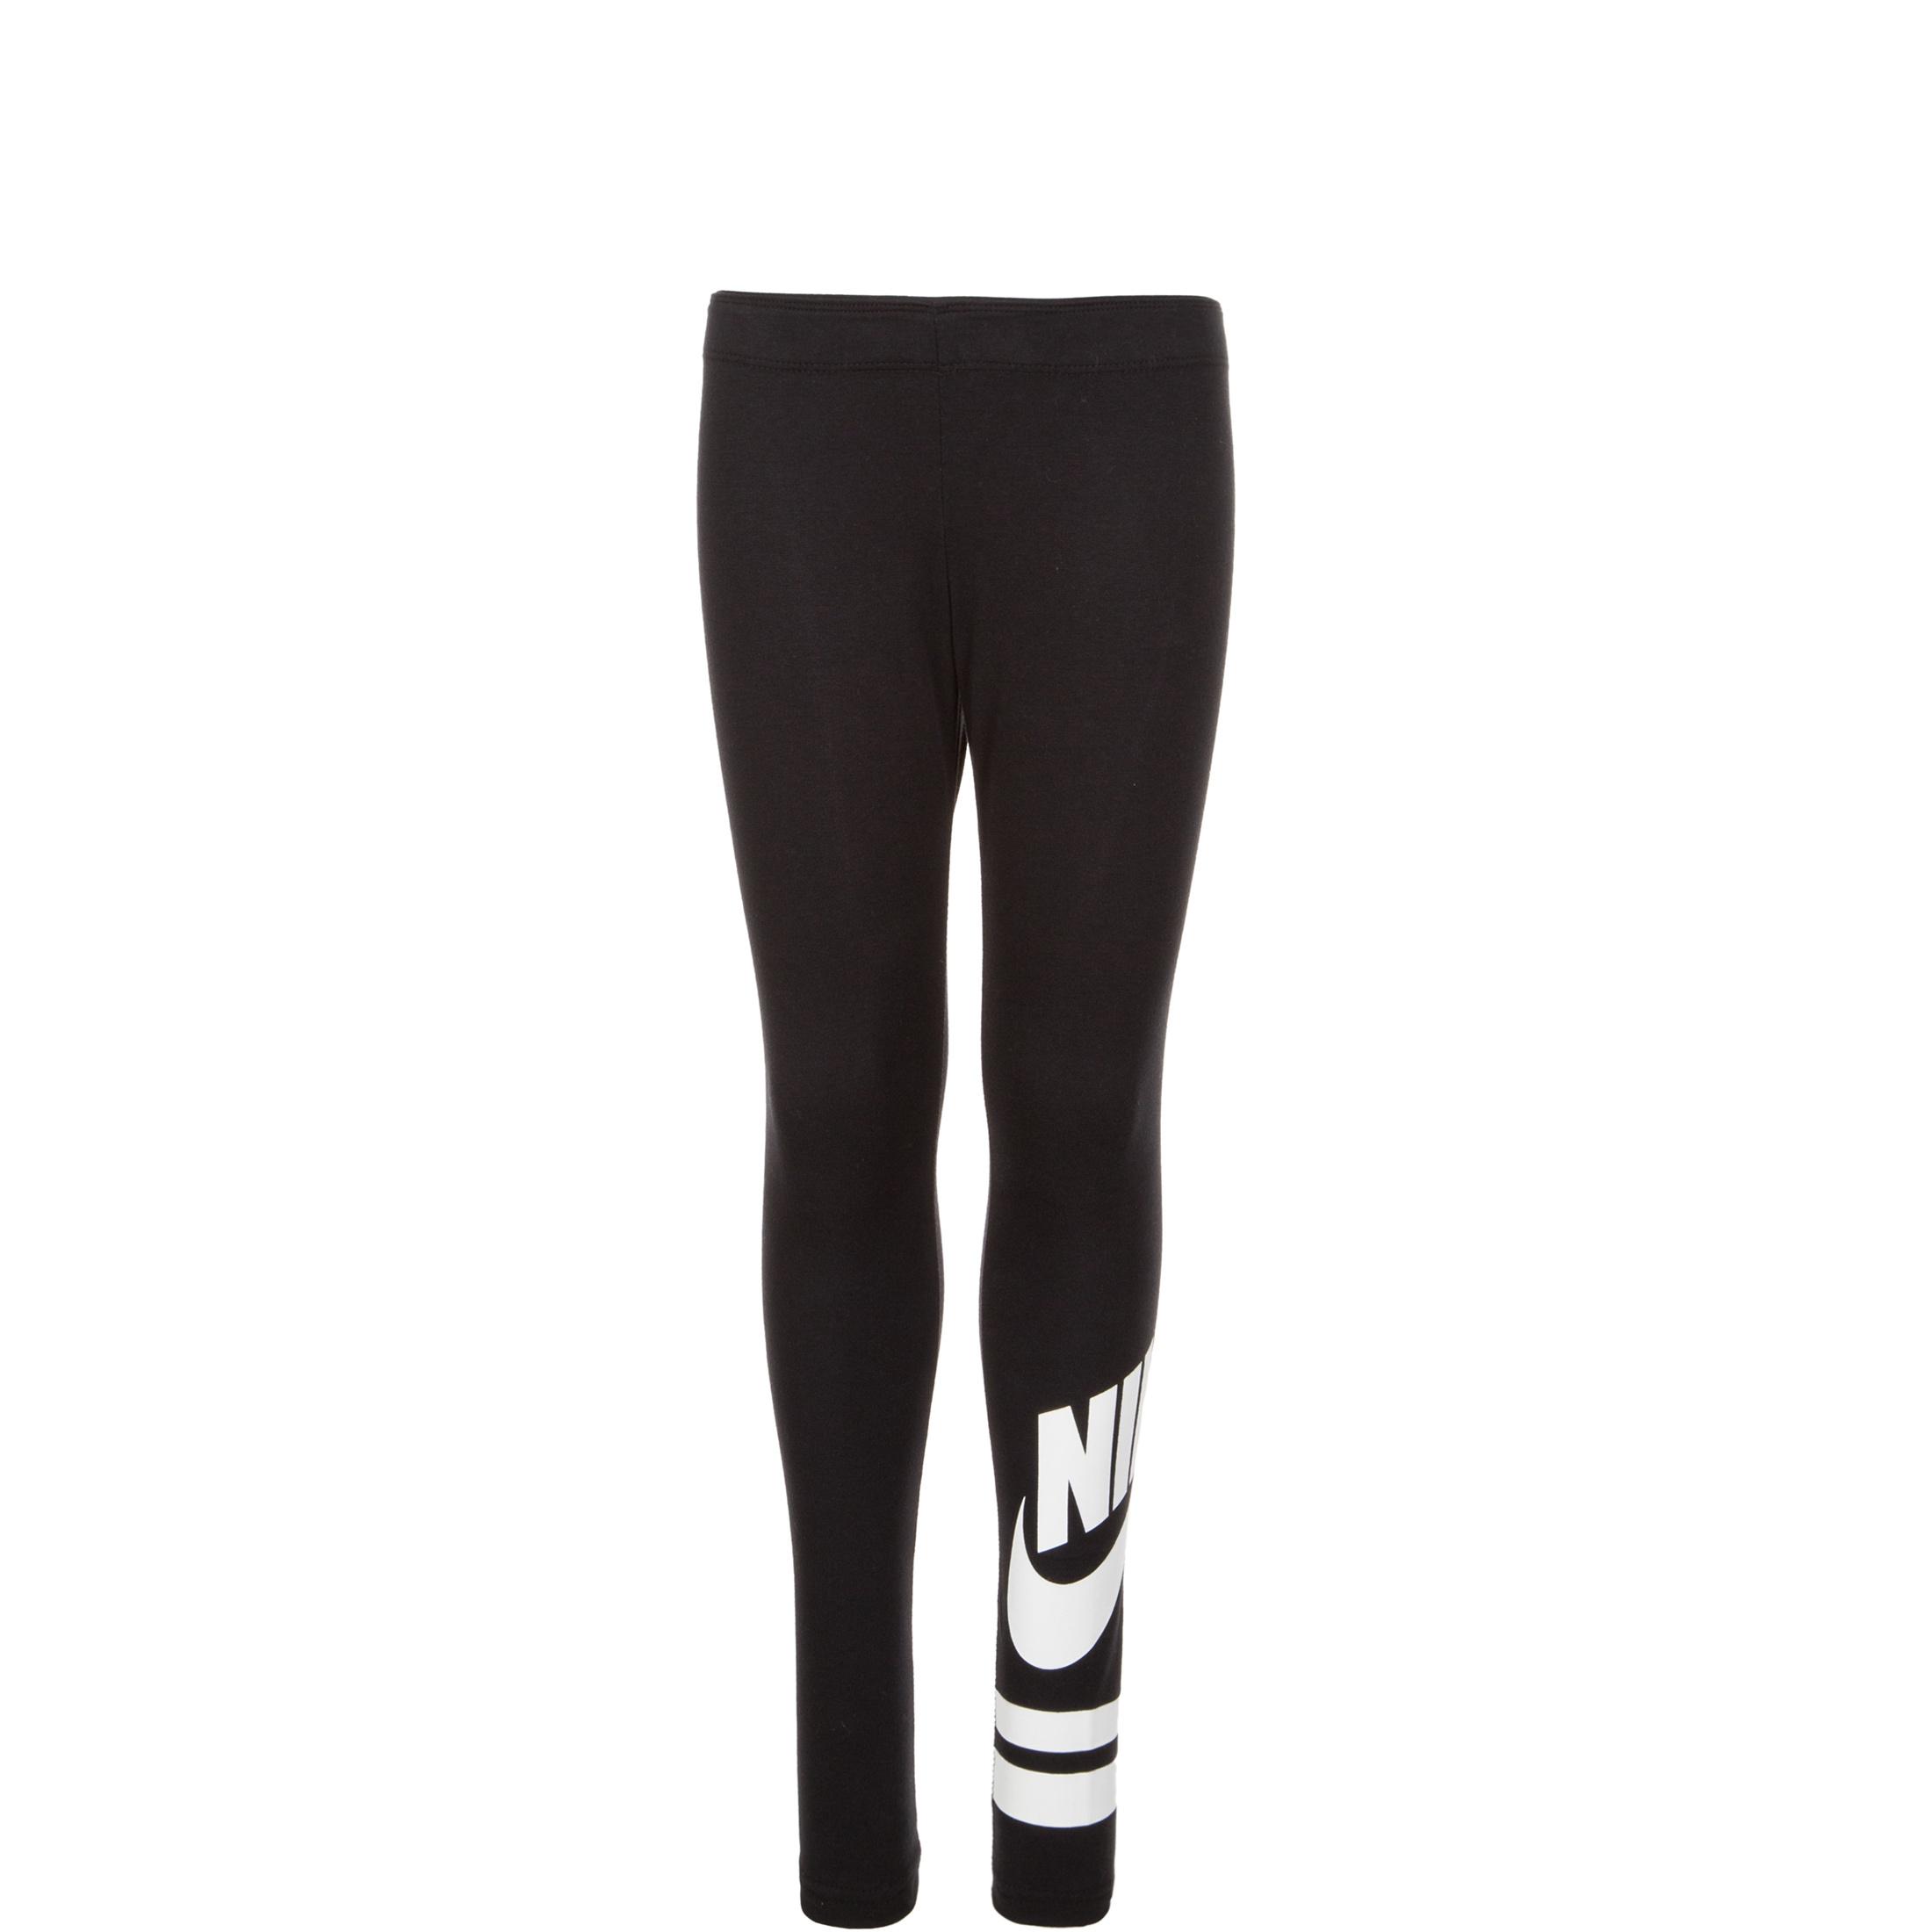 new style 59b85 52370 Nike Sportswear Older Kids  (Girls ) Graphic Leggings - Black   939447-010    FOOTY.COM